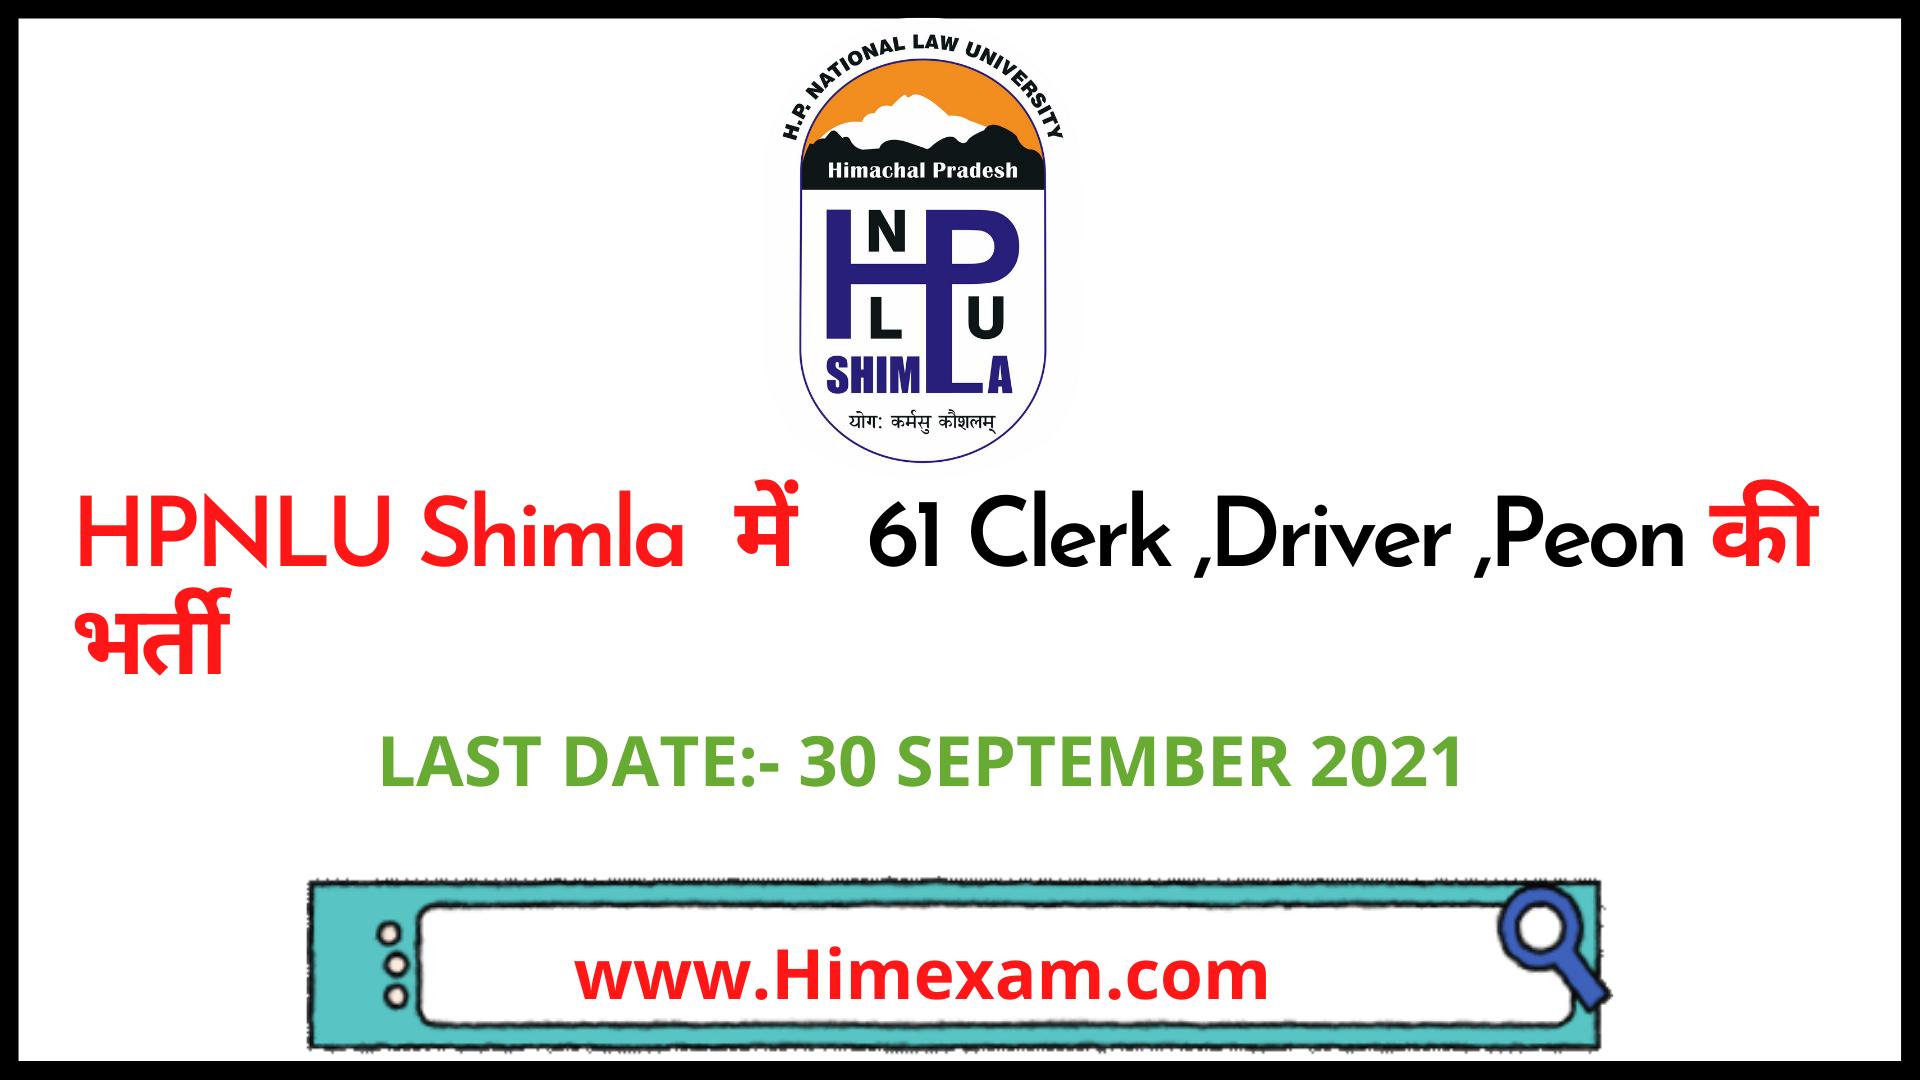 HPNLU Shimla  Recruitment 2021- 61 Clerk ,Driver ,Peon & Other Posts